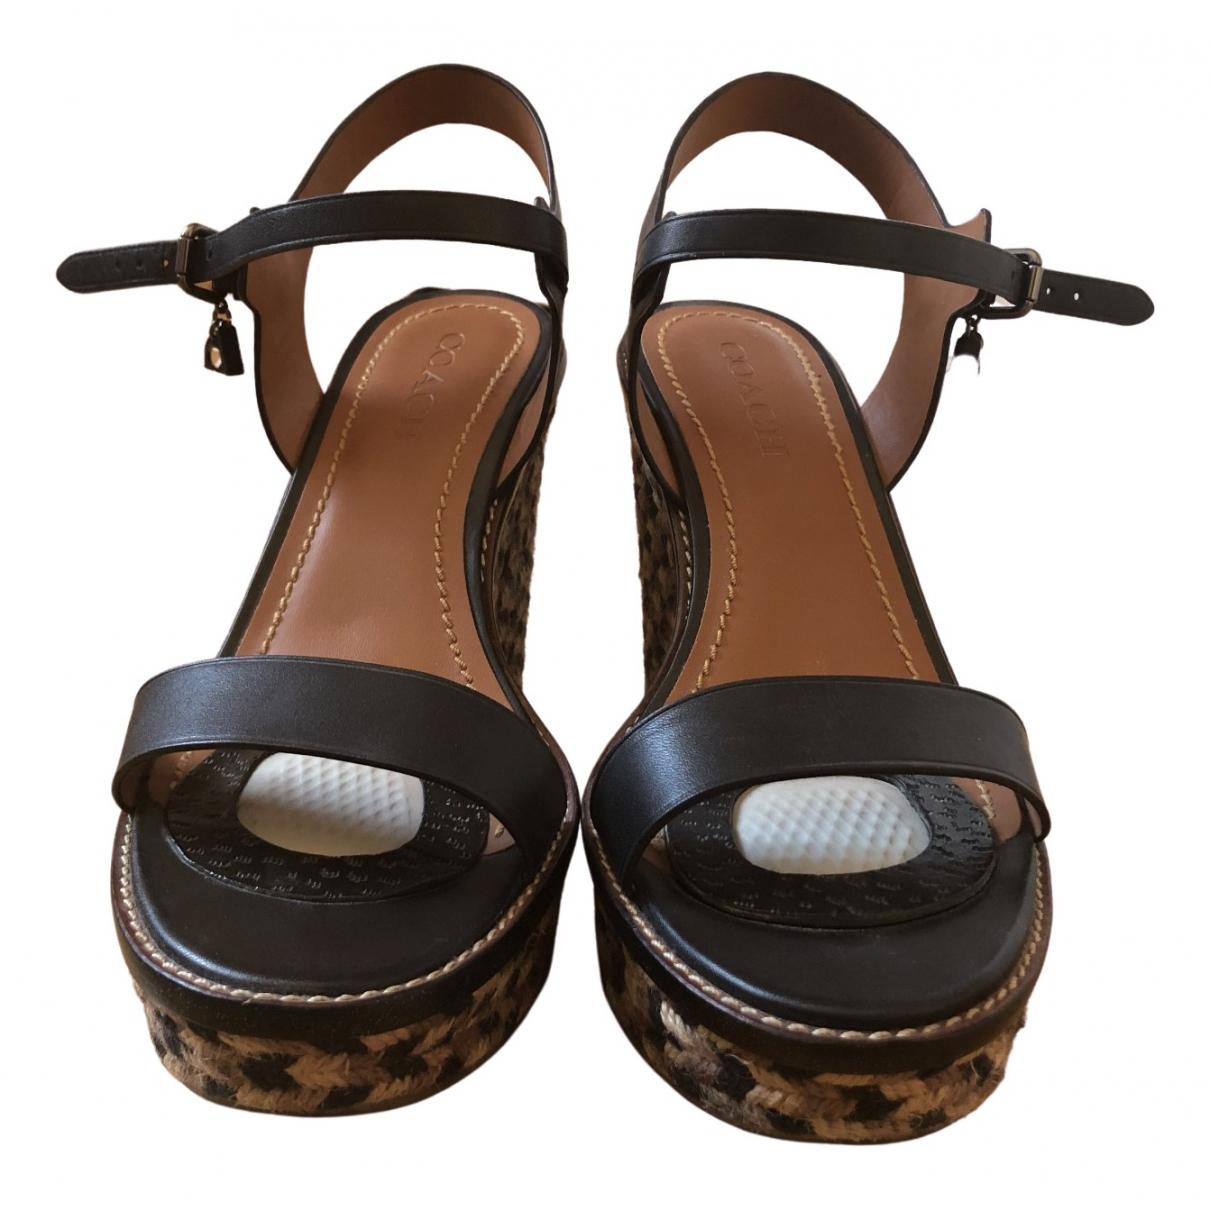 Sandalias de Cuero Coach